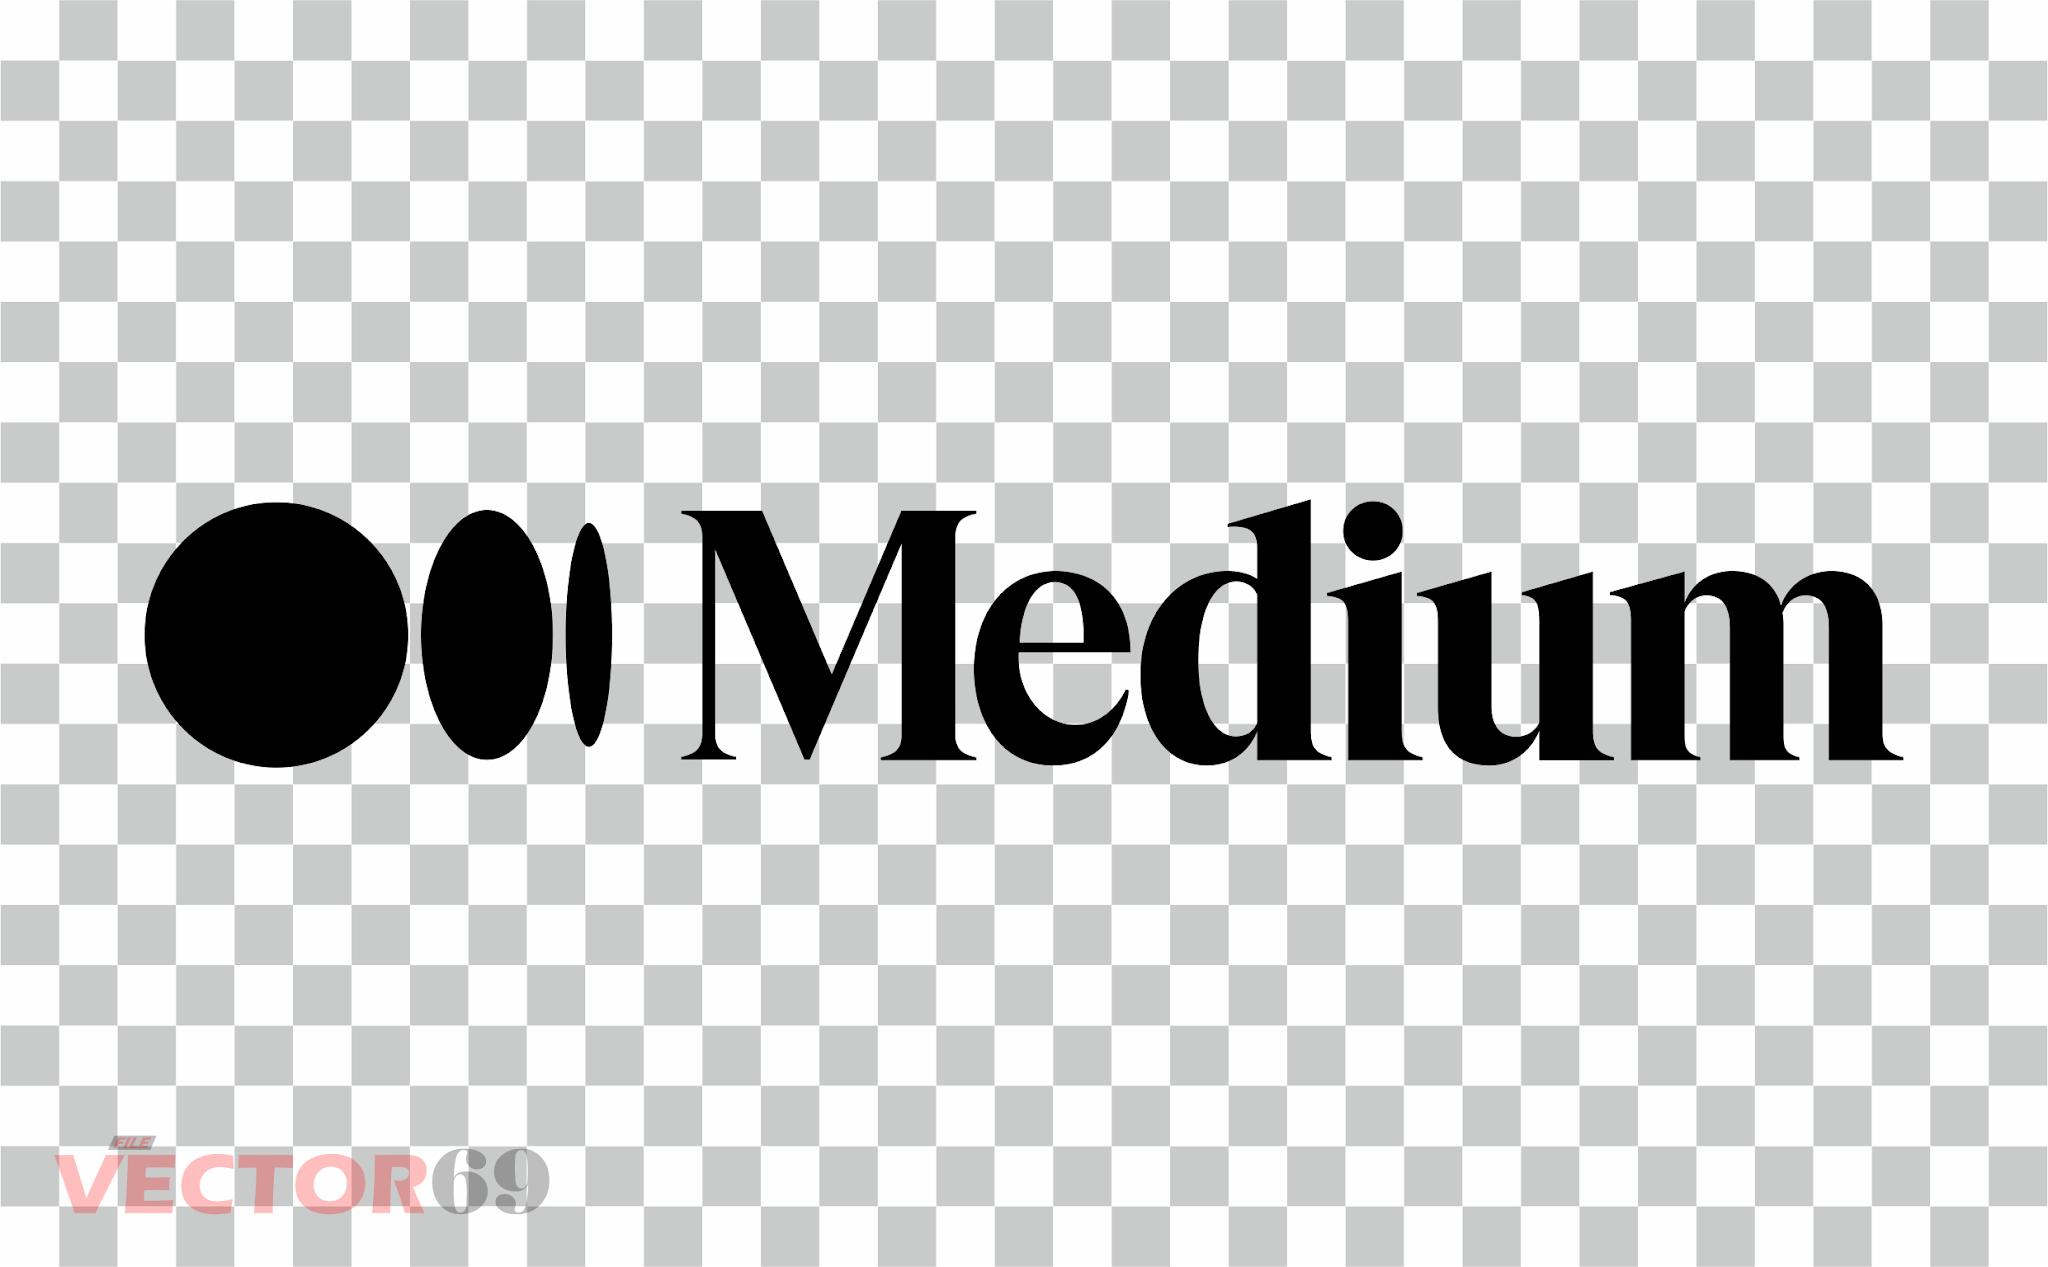 Medium New 2020 Logo - Download Vector File PNG (Portable Network Graphics)